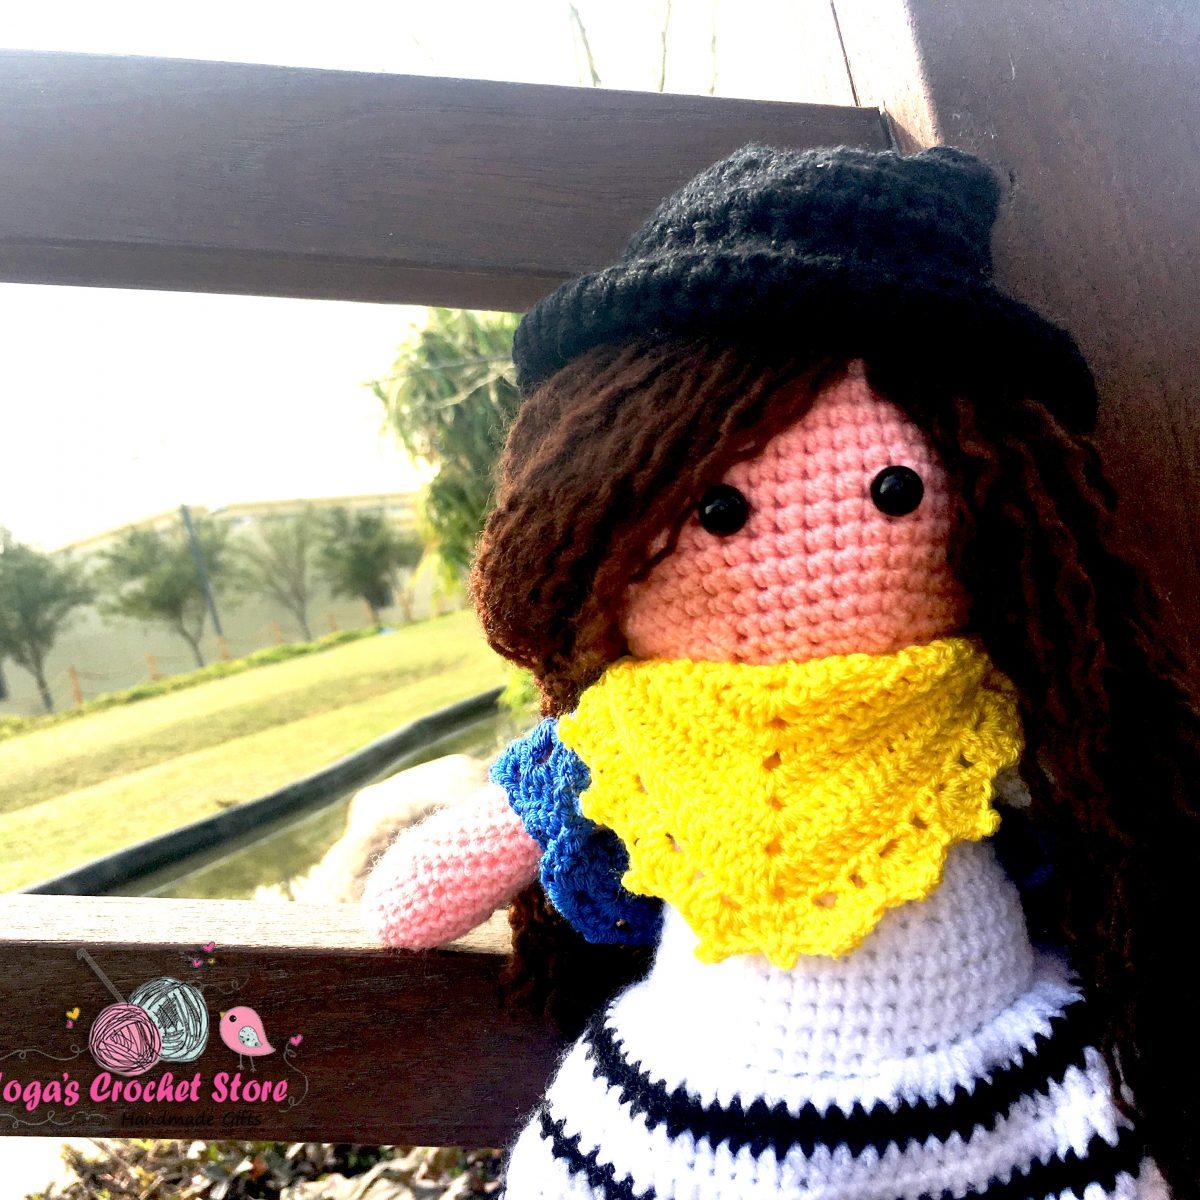 Noga Crochet Store